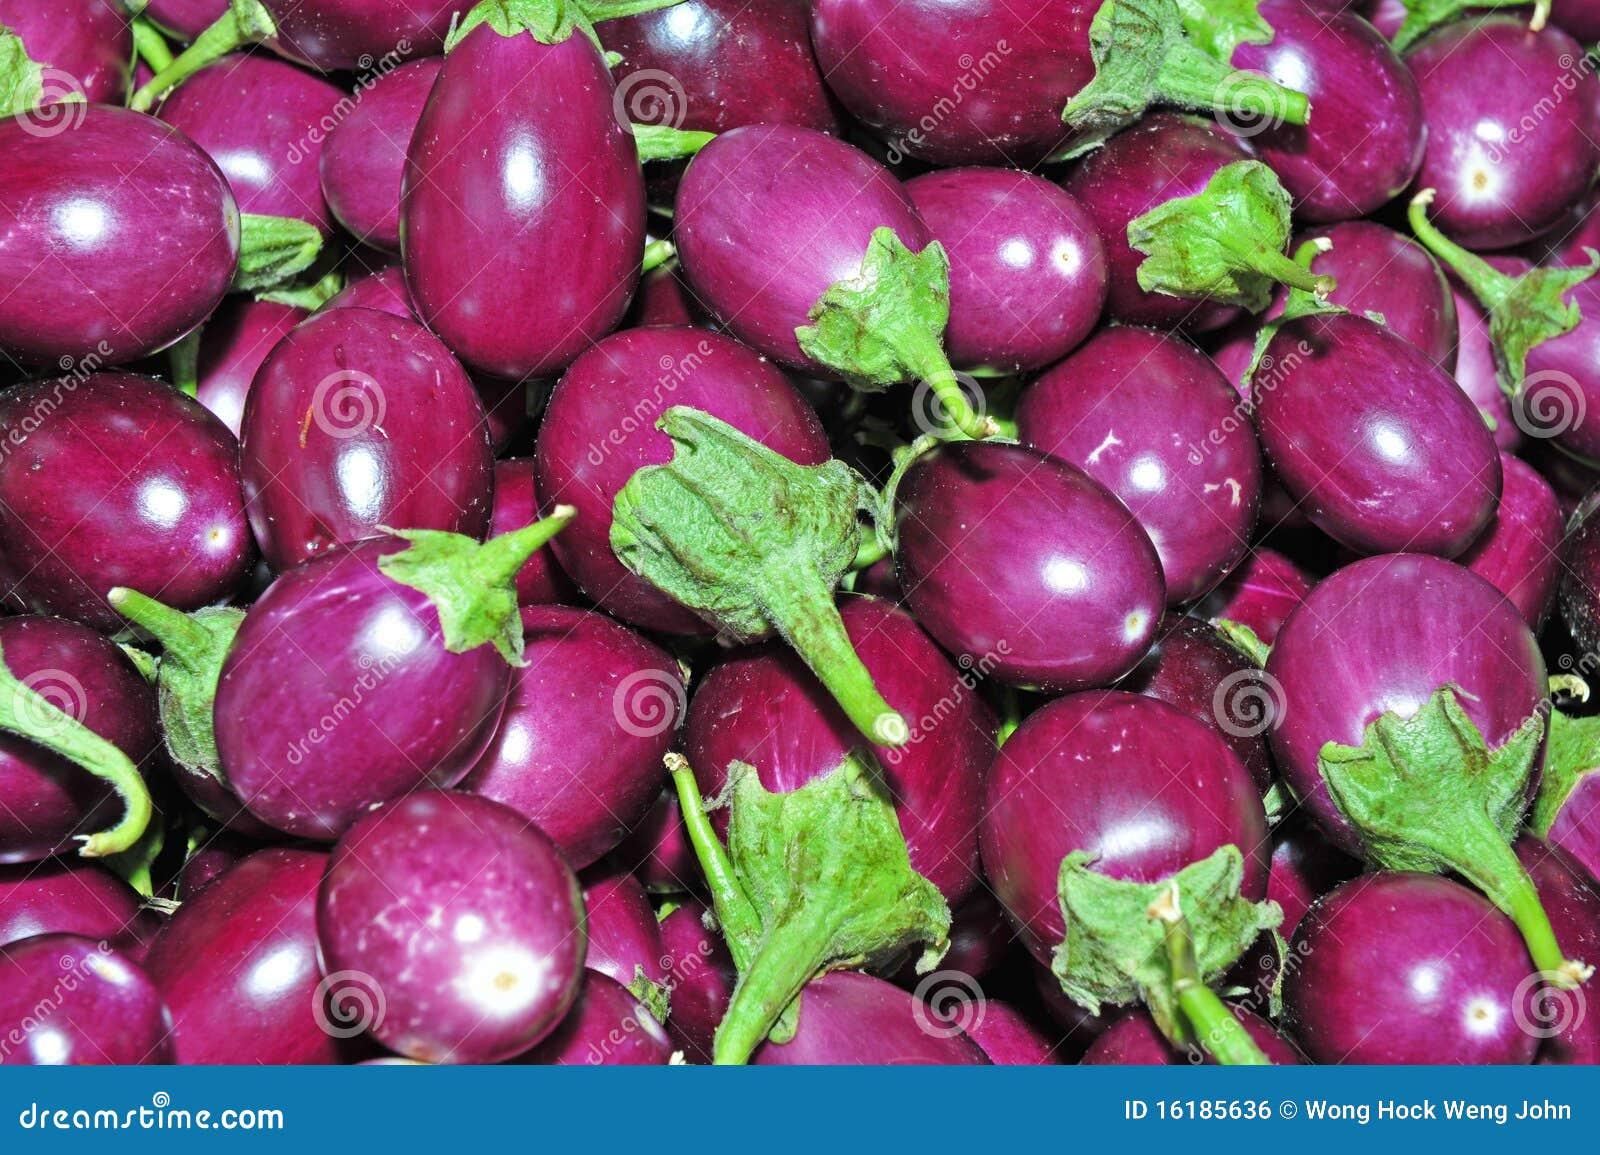 is an eggplant a fruit fruit porn